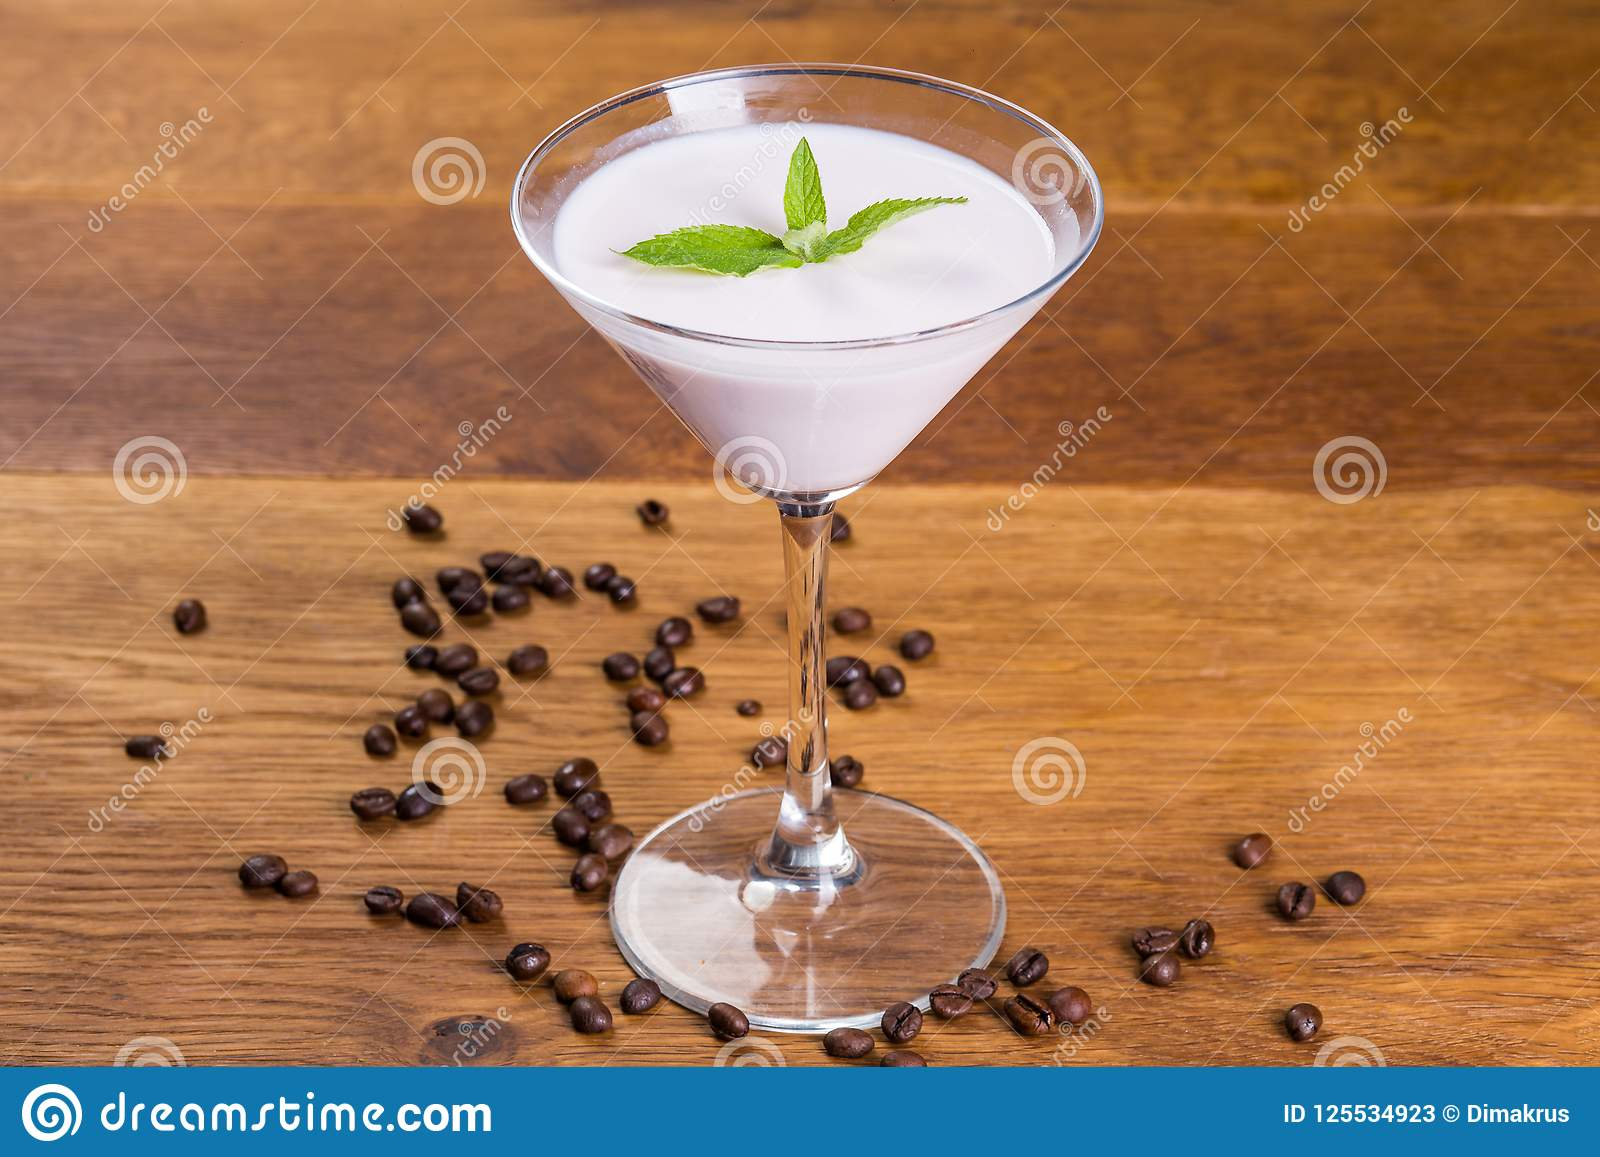 Dessert. Milk pudding with vanilla aroma and mint lentik